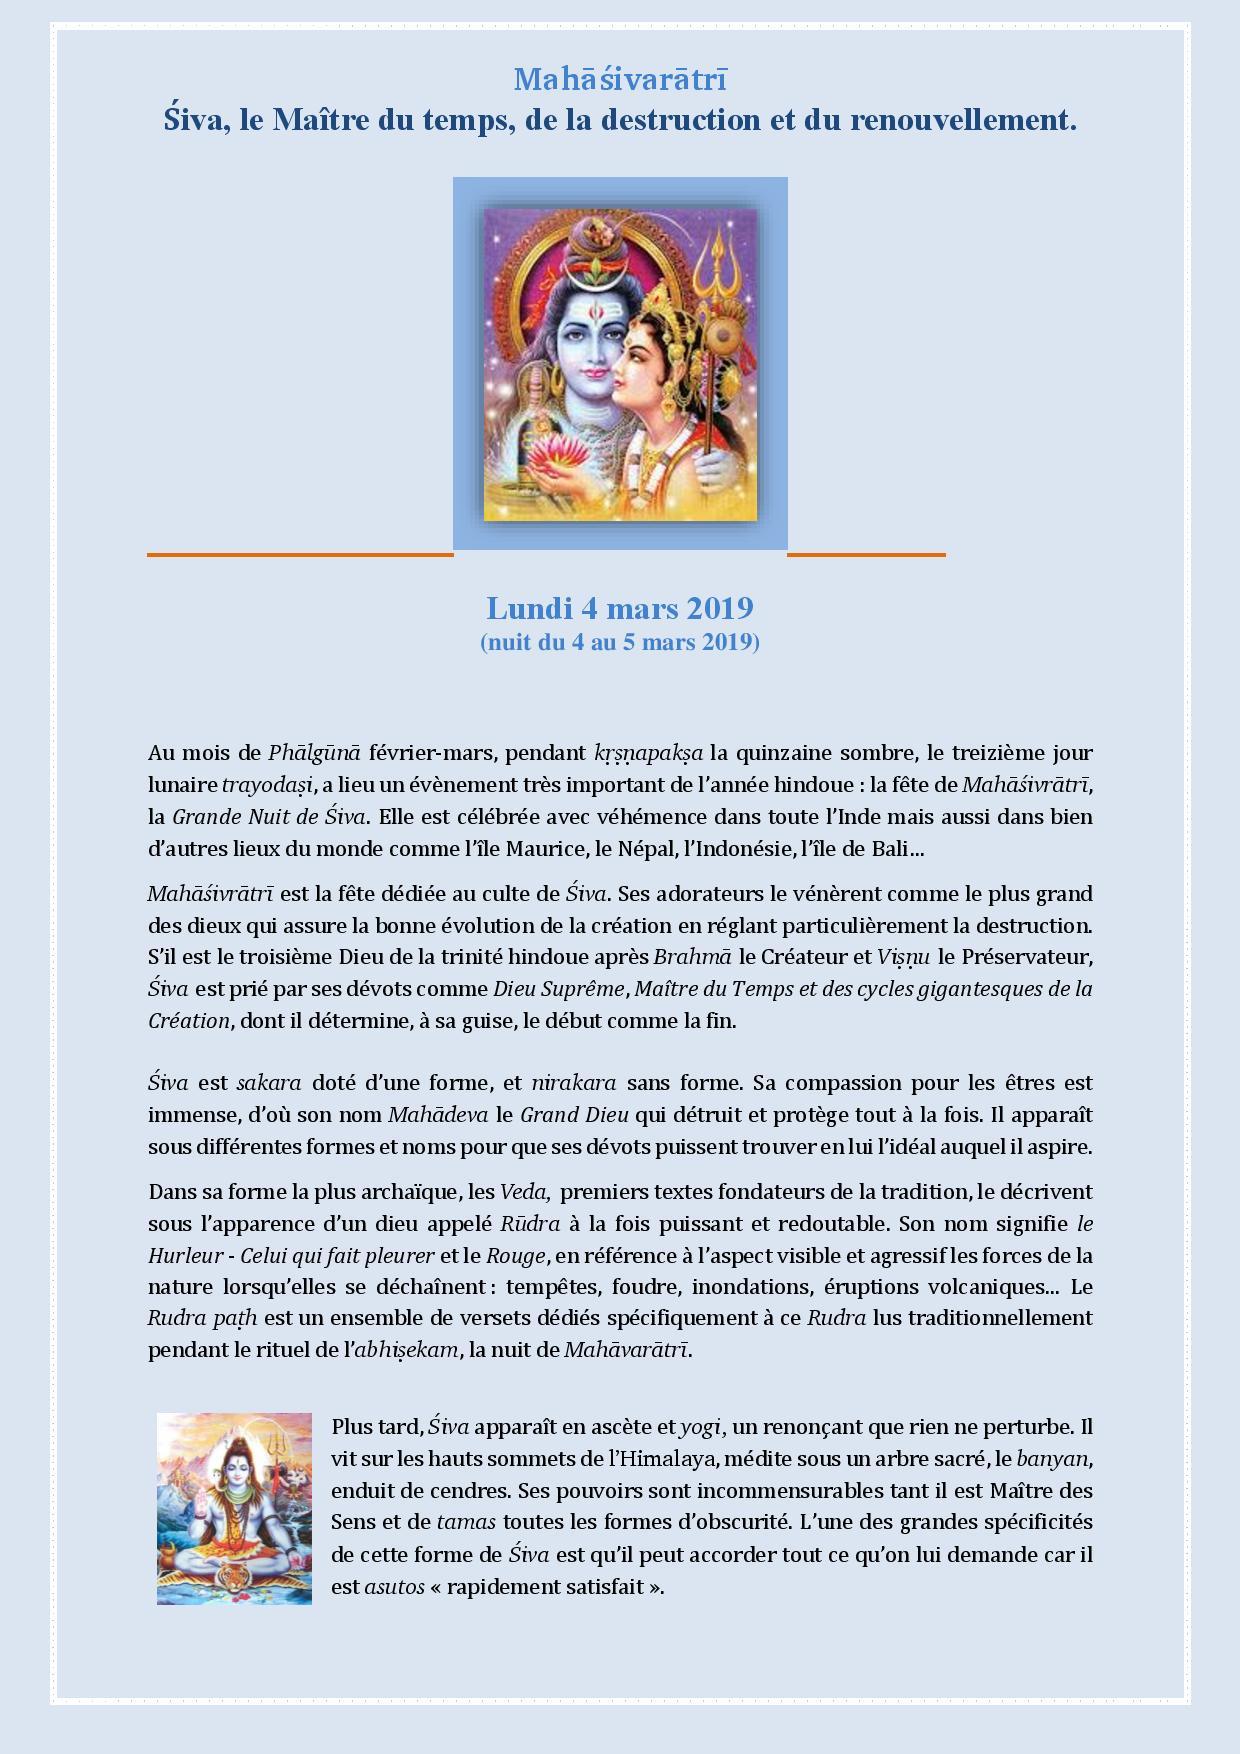 MAHASHIVARATRI 2019 SHIVA 2019-page-001